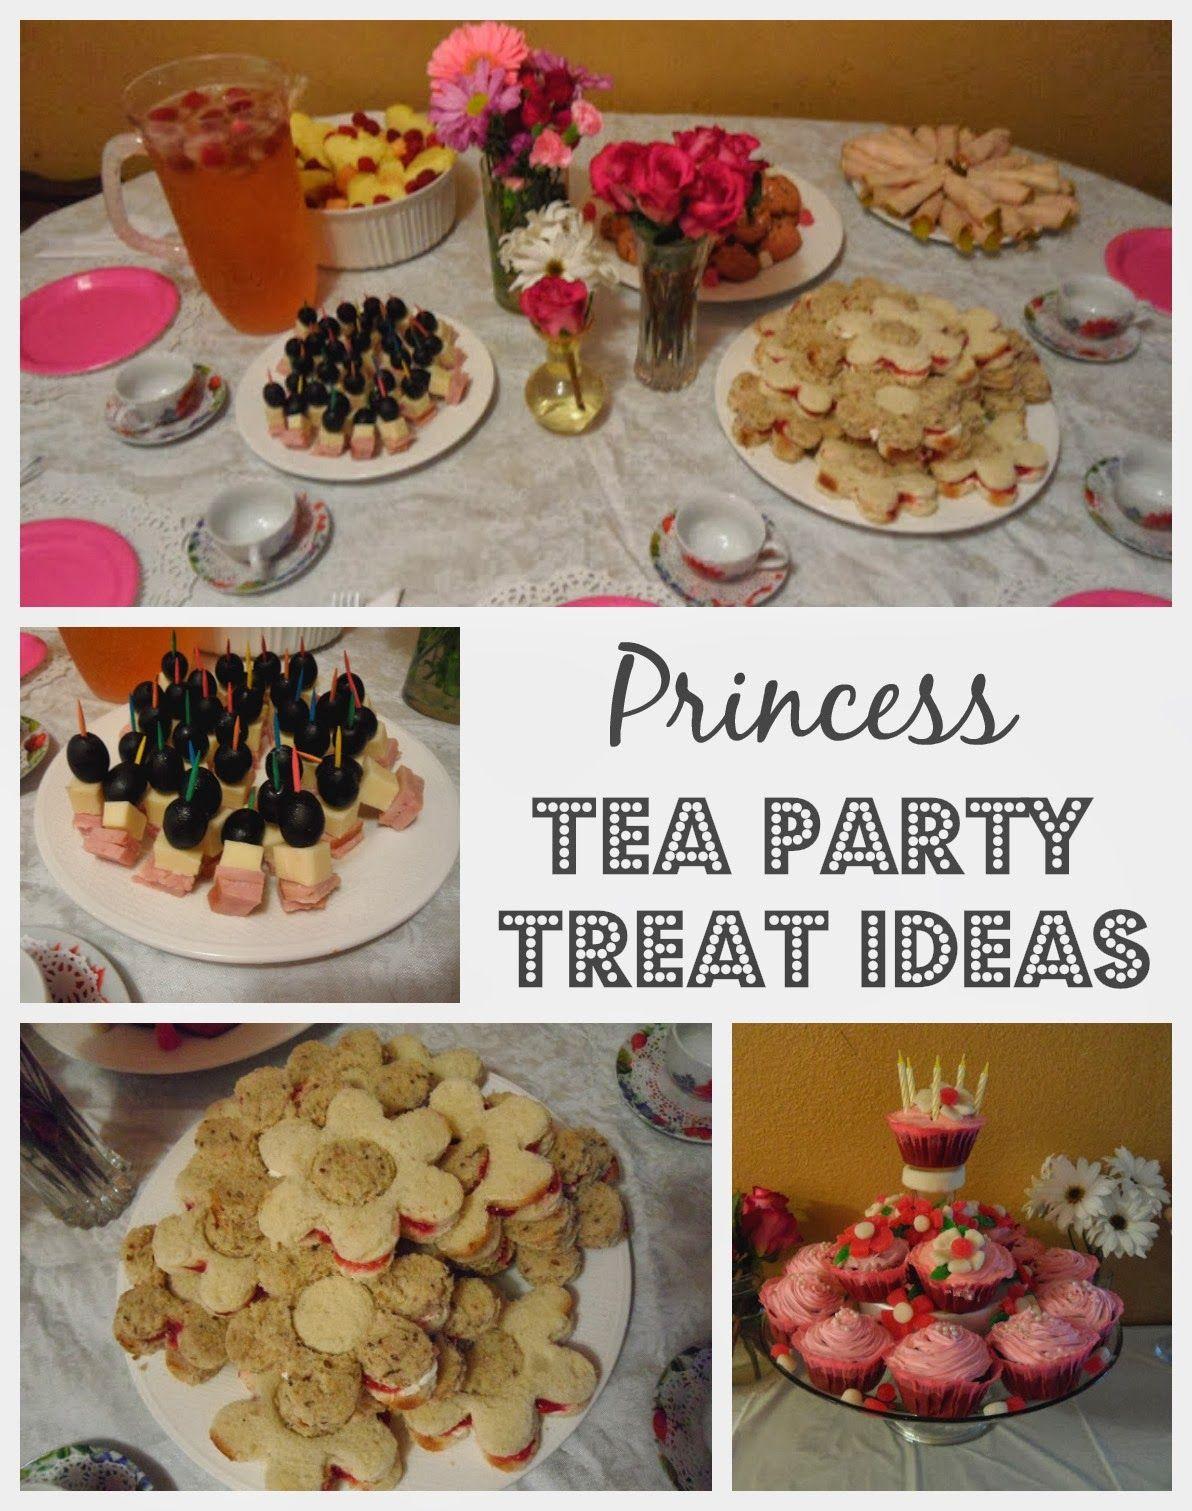 Princess Birthday Party Food Ideas